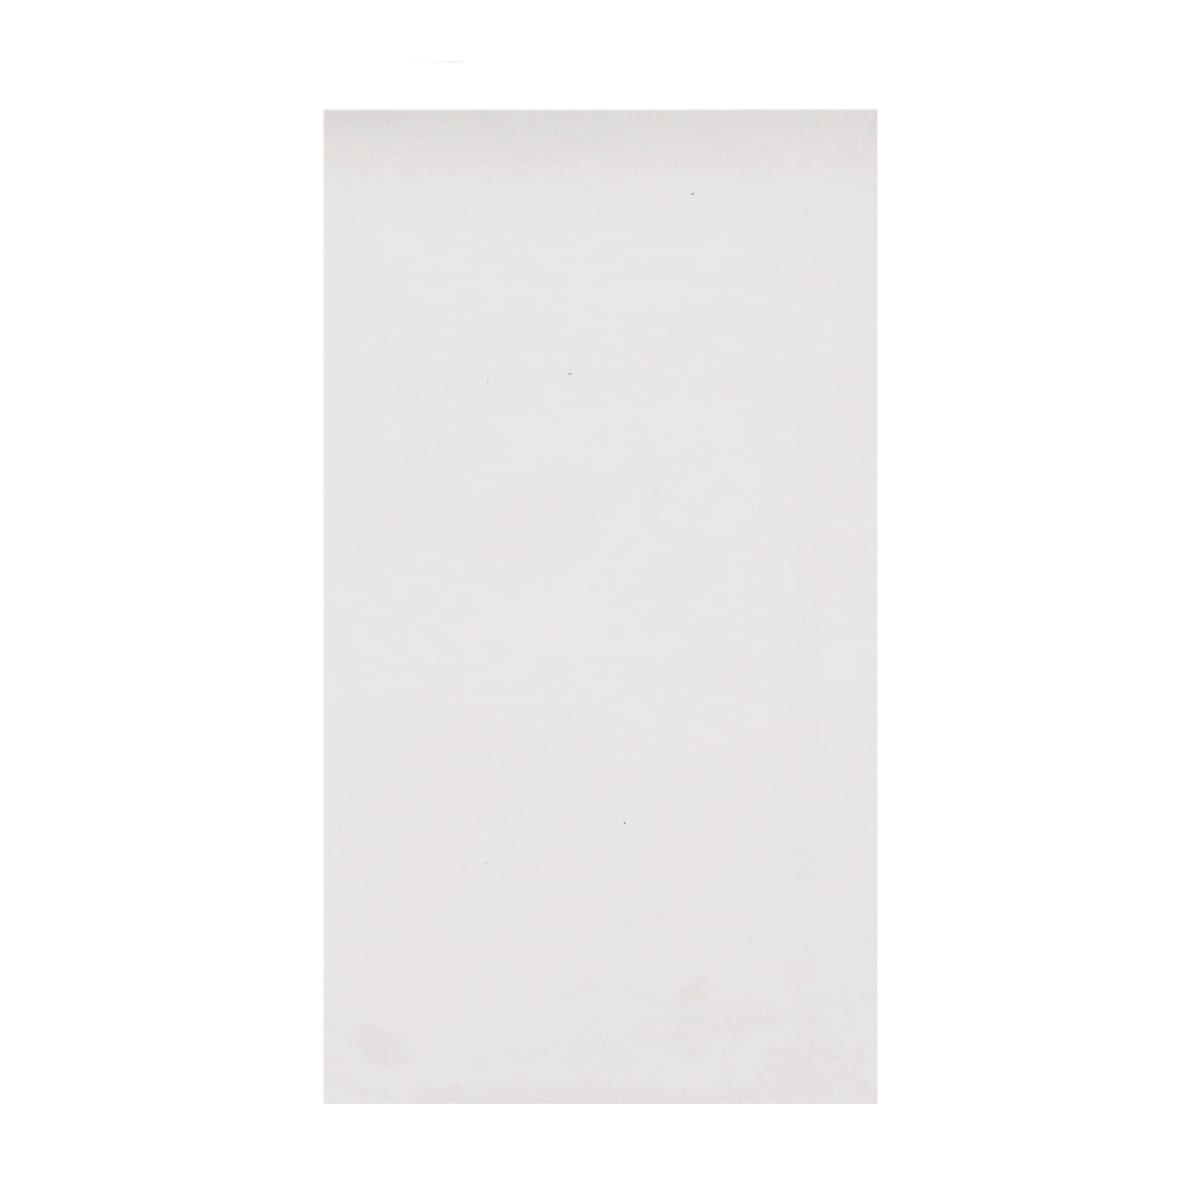 165 x 100mm WHITE ECO LIGHT PADDED BAGS